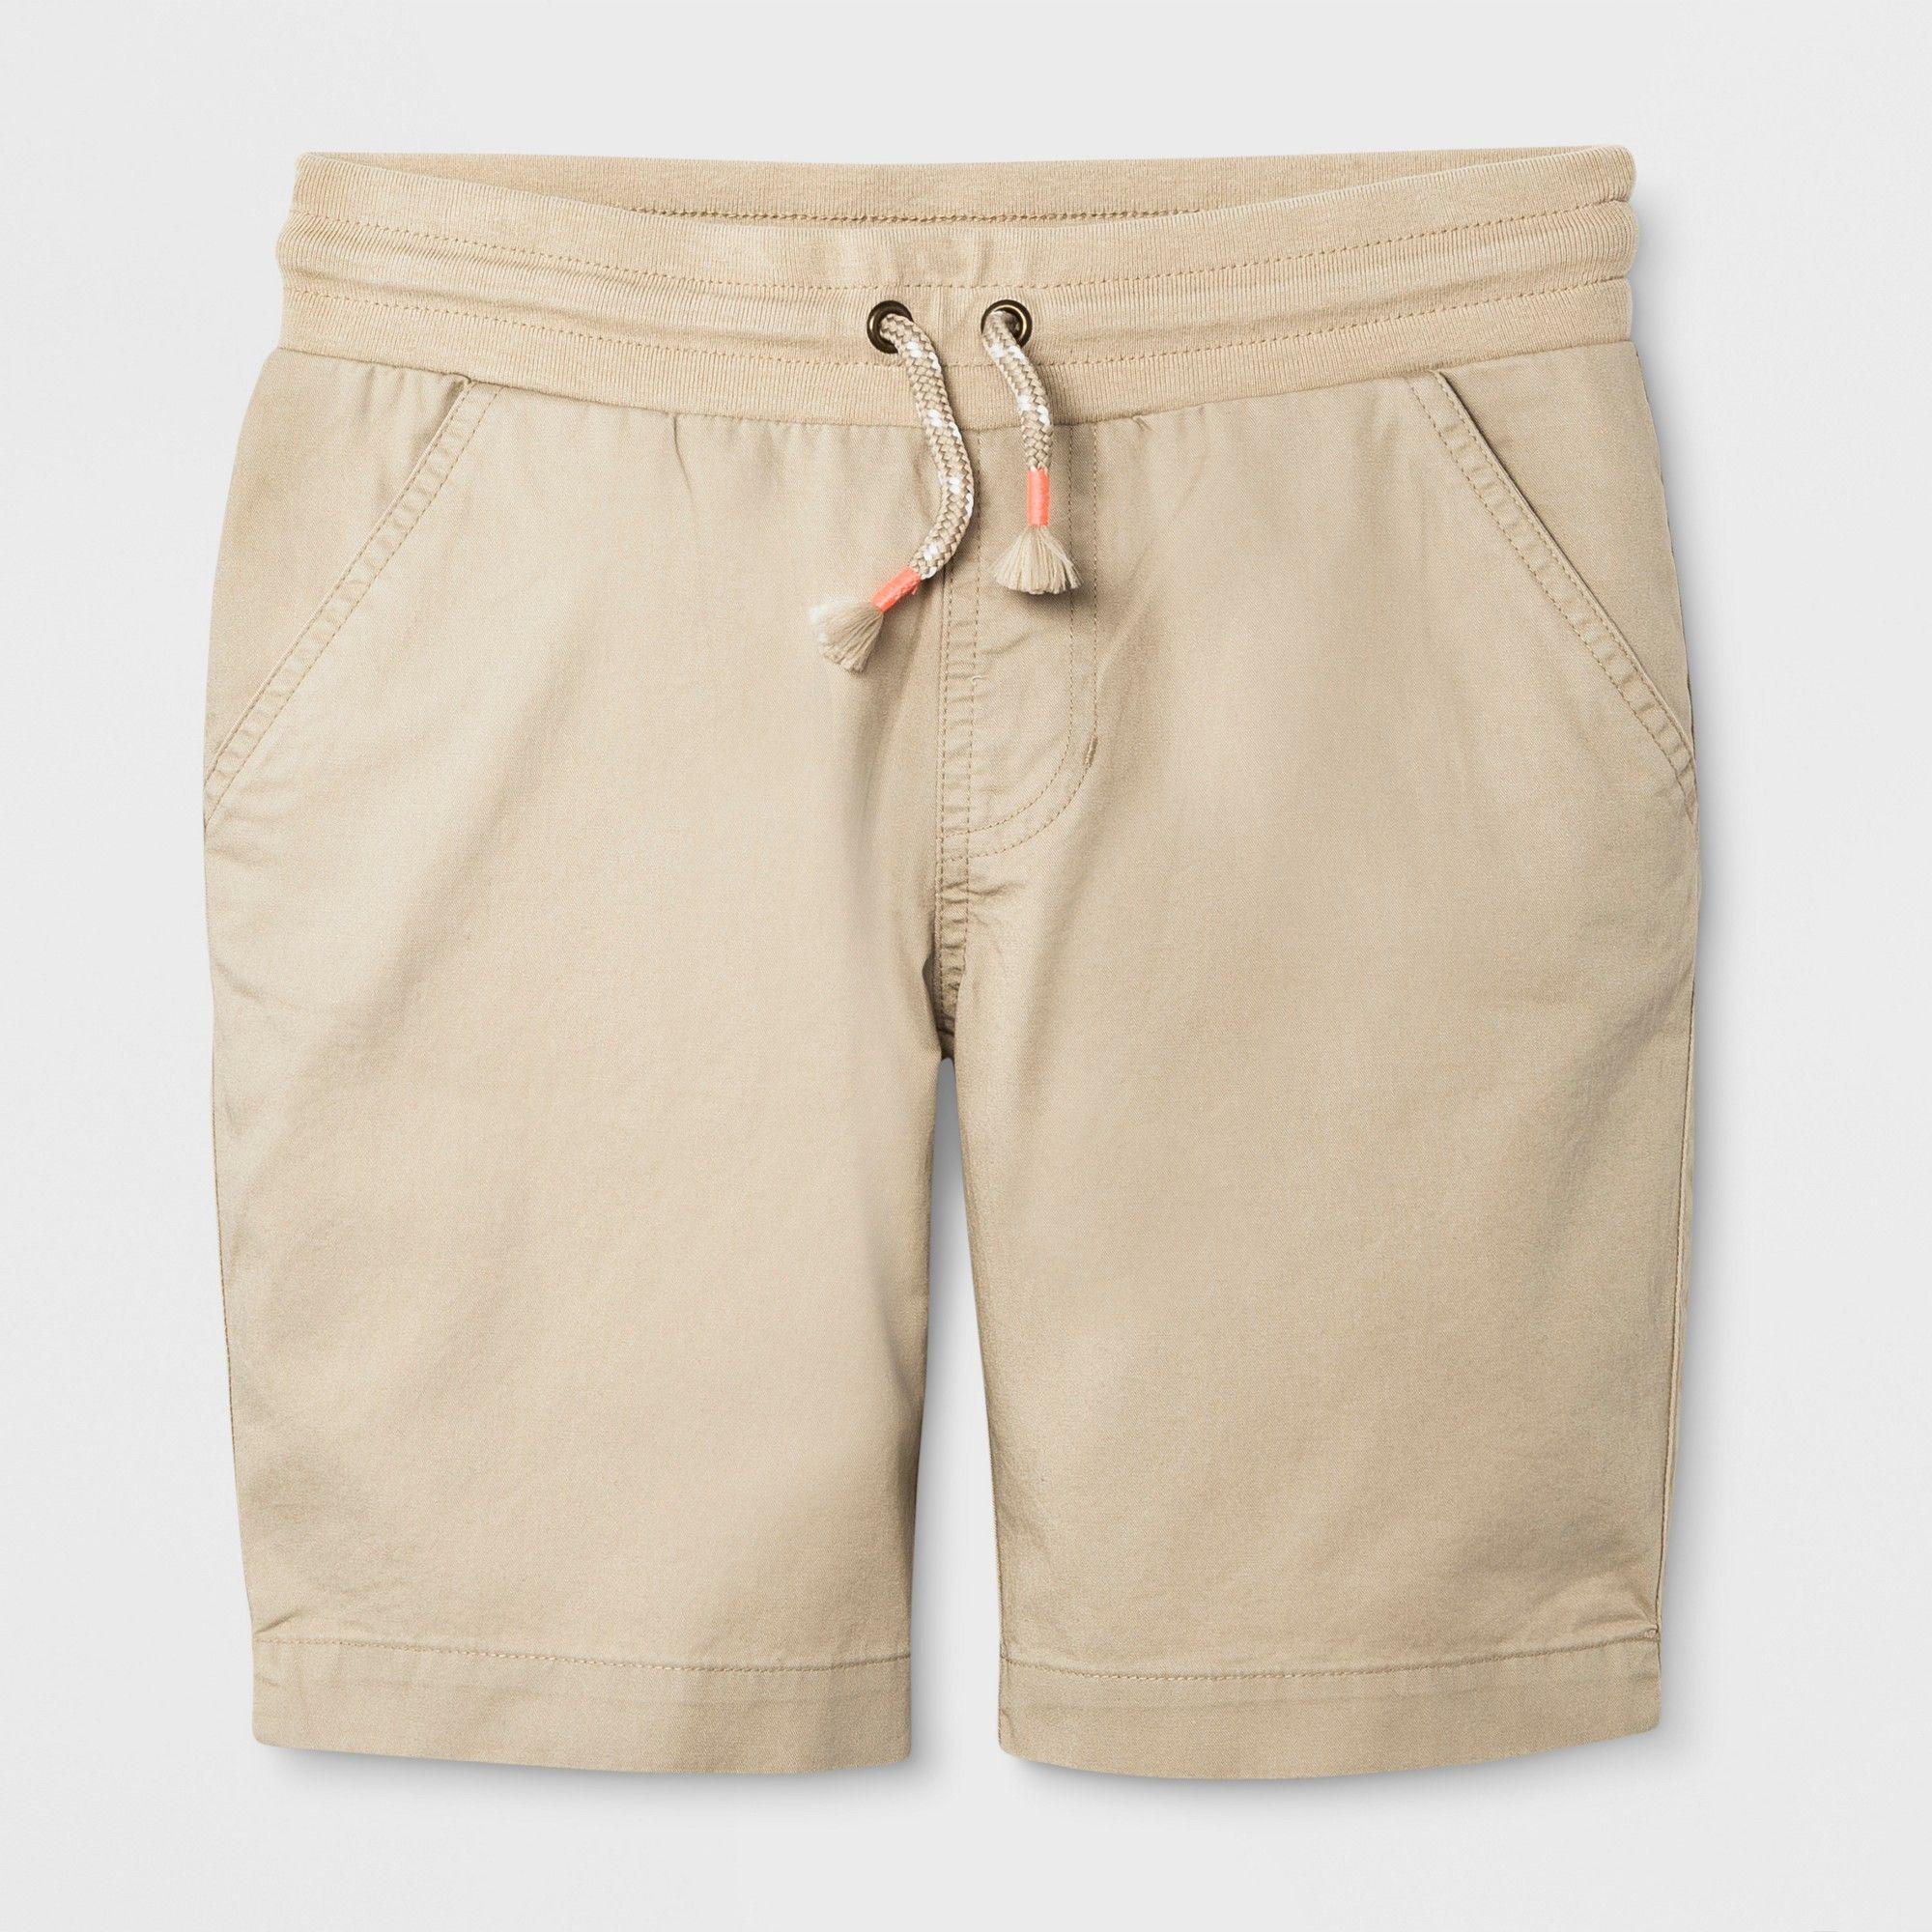 8d4e97dde36 Plus Size Girls  Twill Bermuda Chino Shorts - Cat   Jack Pita Bread L Plus